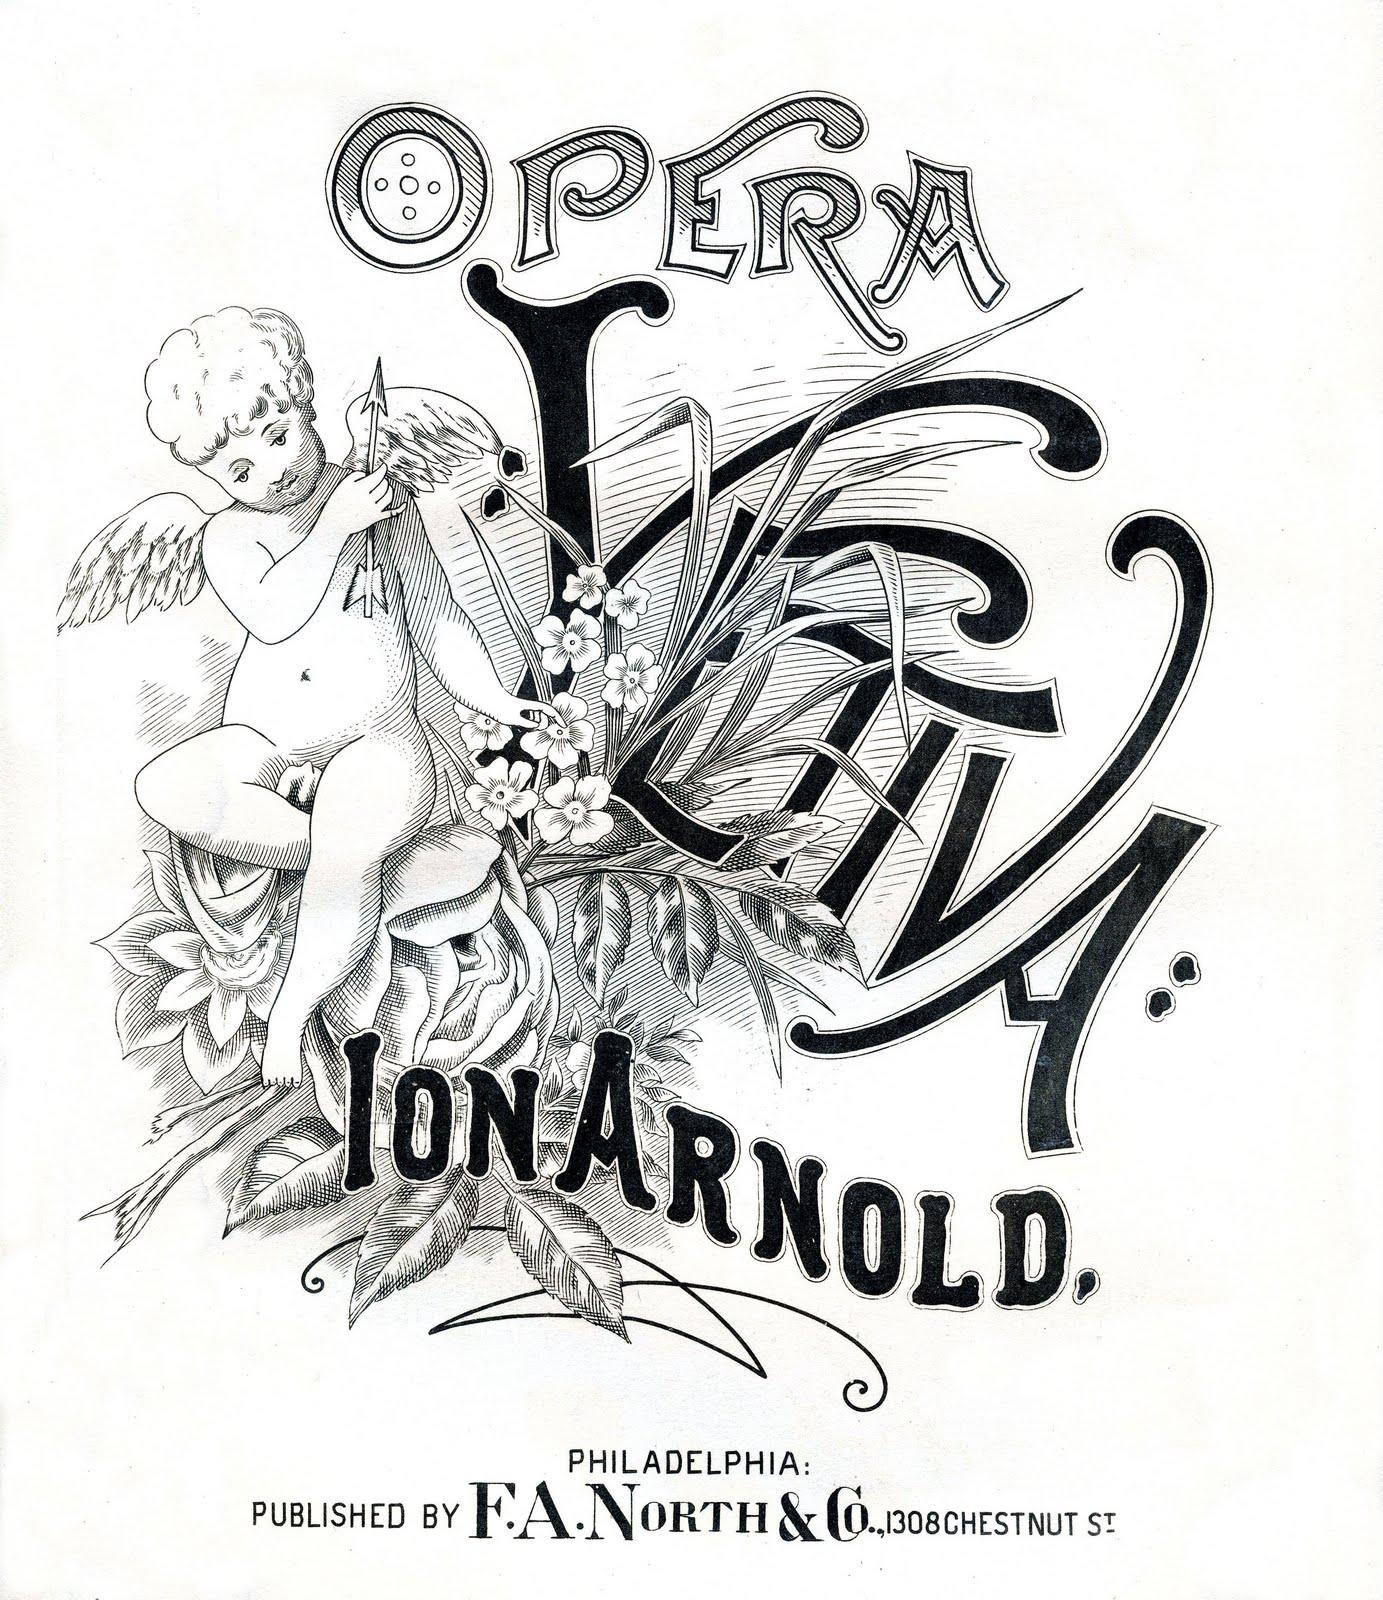 Sheet Music clipart old I Opera Sheet sheet of